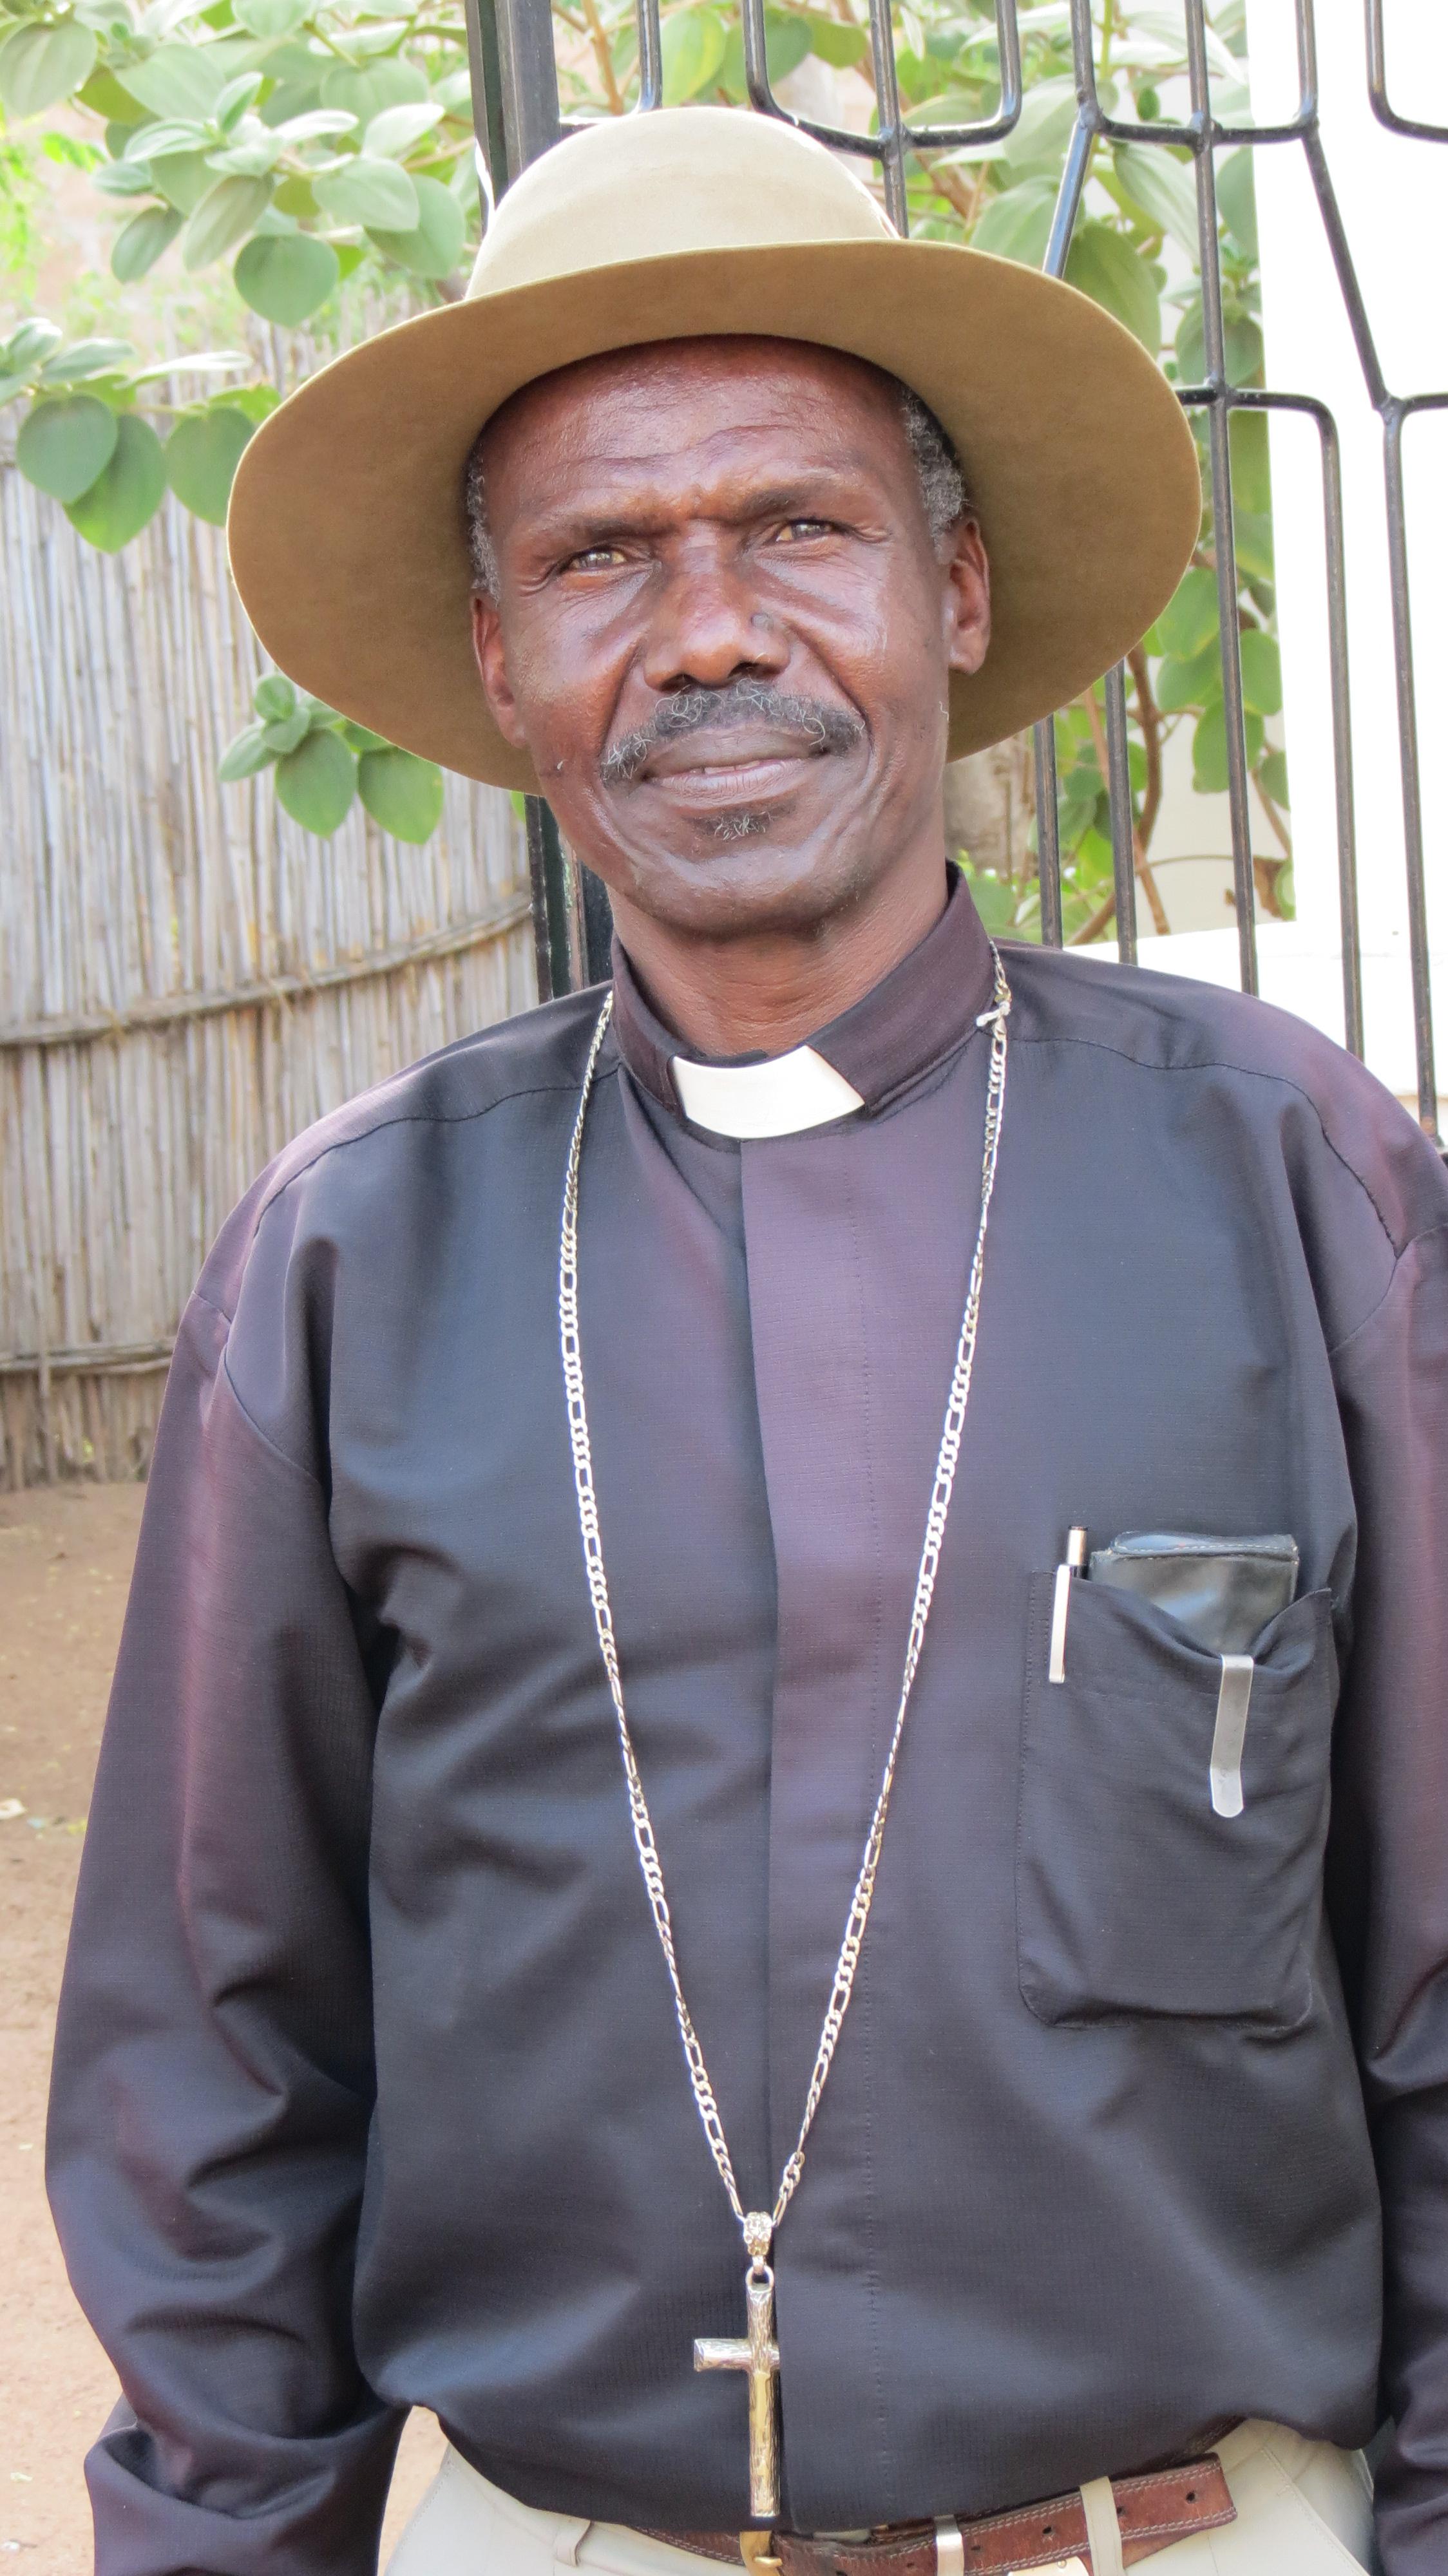 Bishop Clemence Ottieno